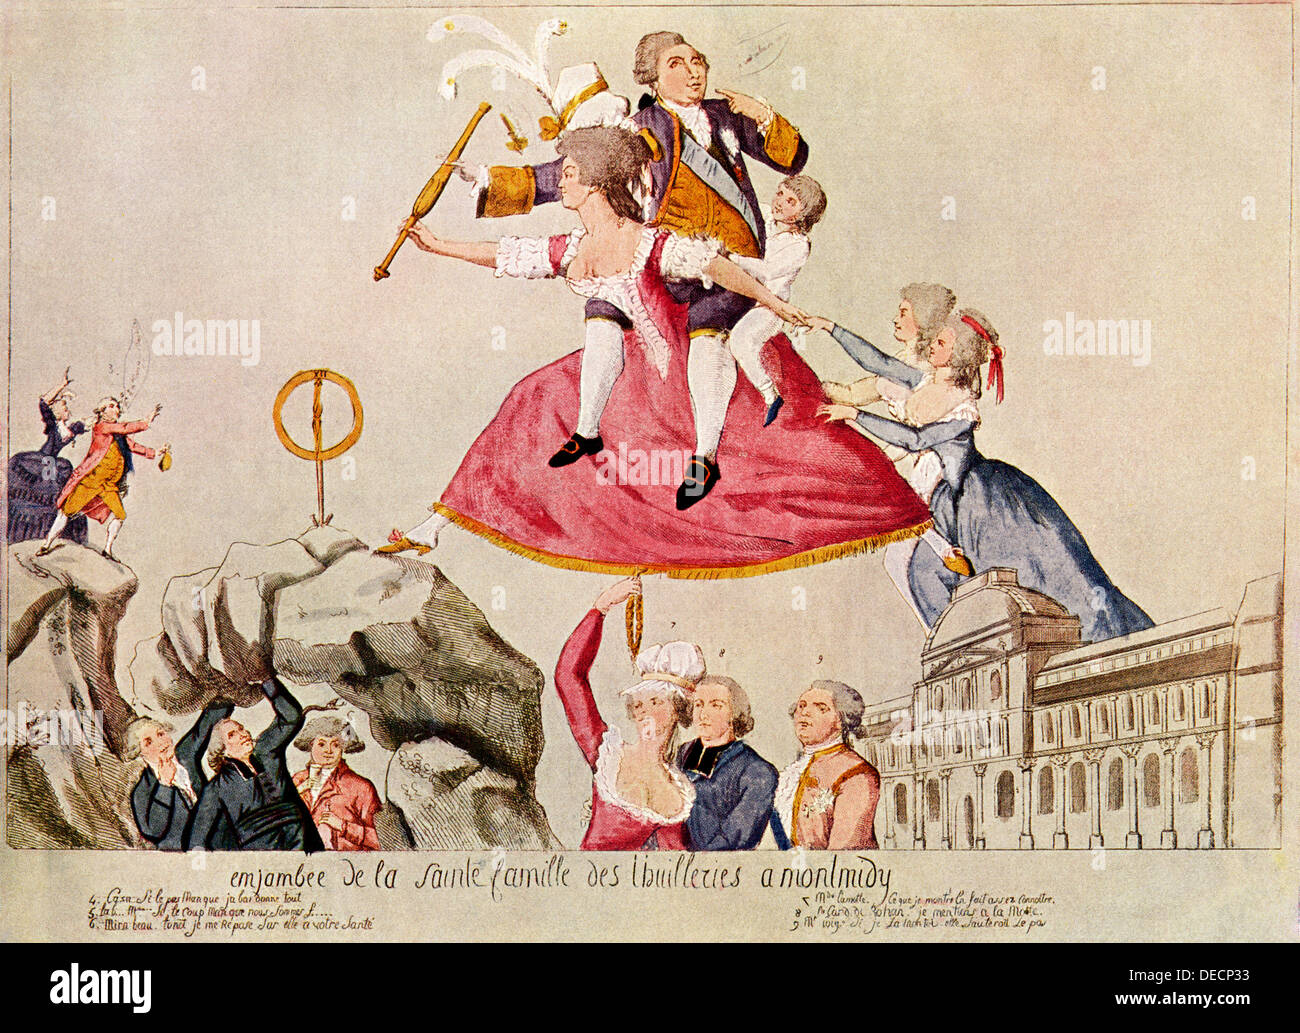 Sortons de la matrice républicaine Caricature-of-french-king-louis-xvi-and-his-son-riding-on-the-back-DECP33